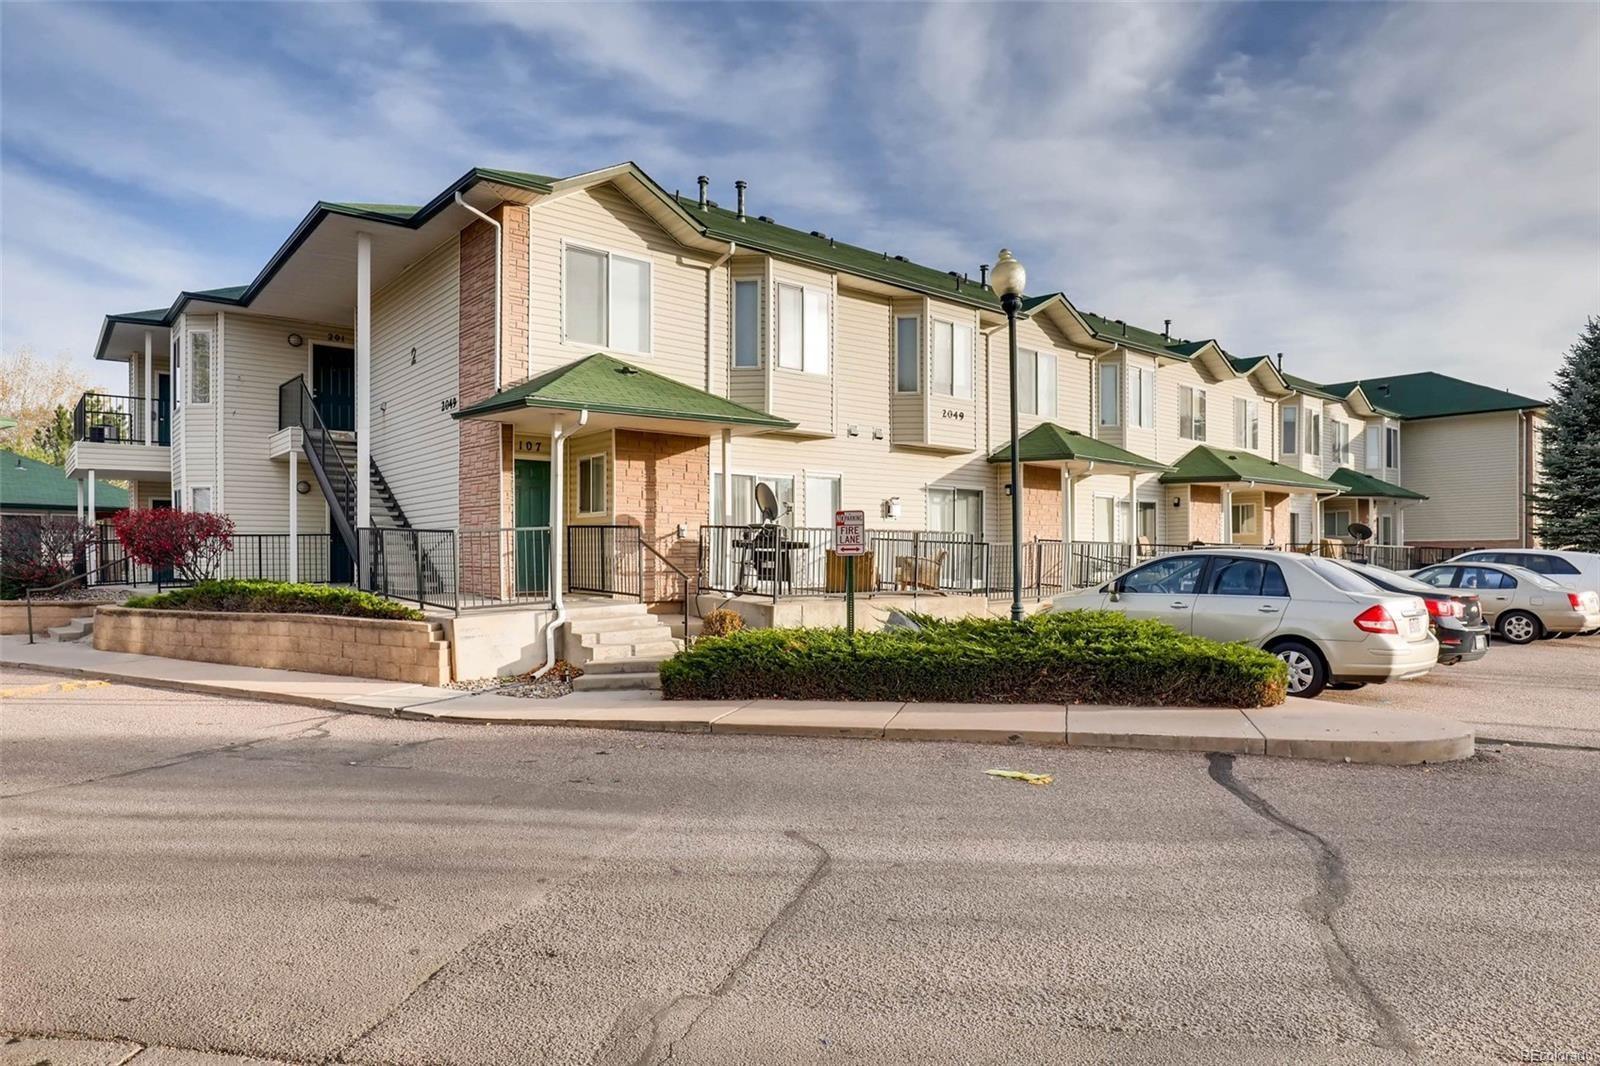 MLS# 9808696 - 5 - 2049 Legacy Ridge View, Colorado Springs, CO 80910